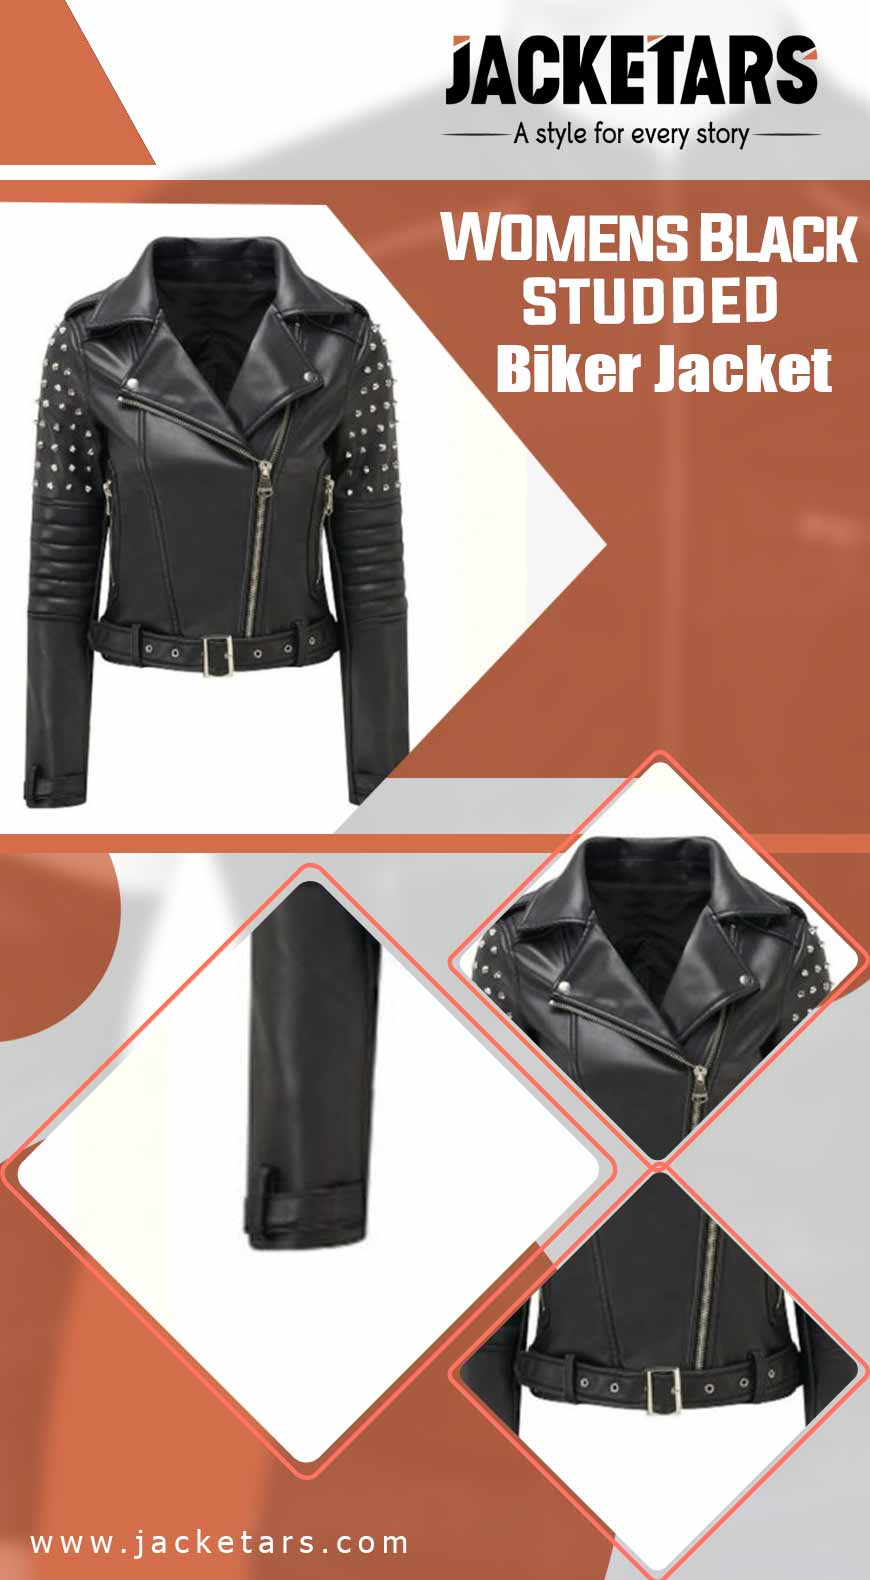 Womens Black Studded Biker Jacket info